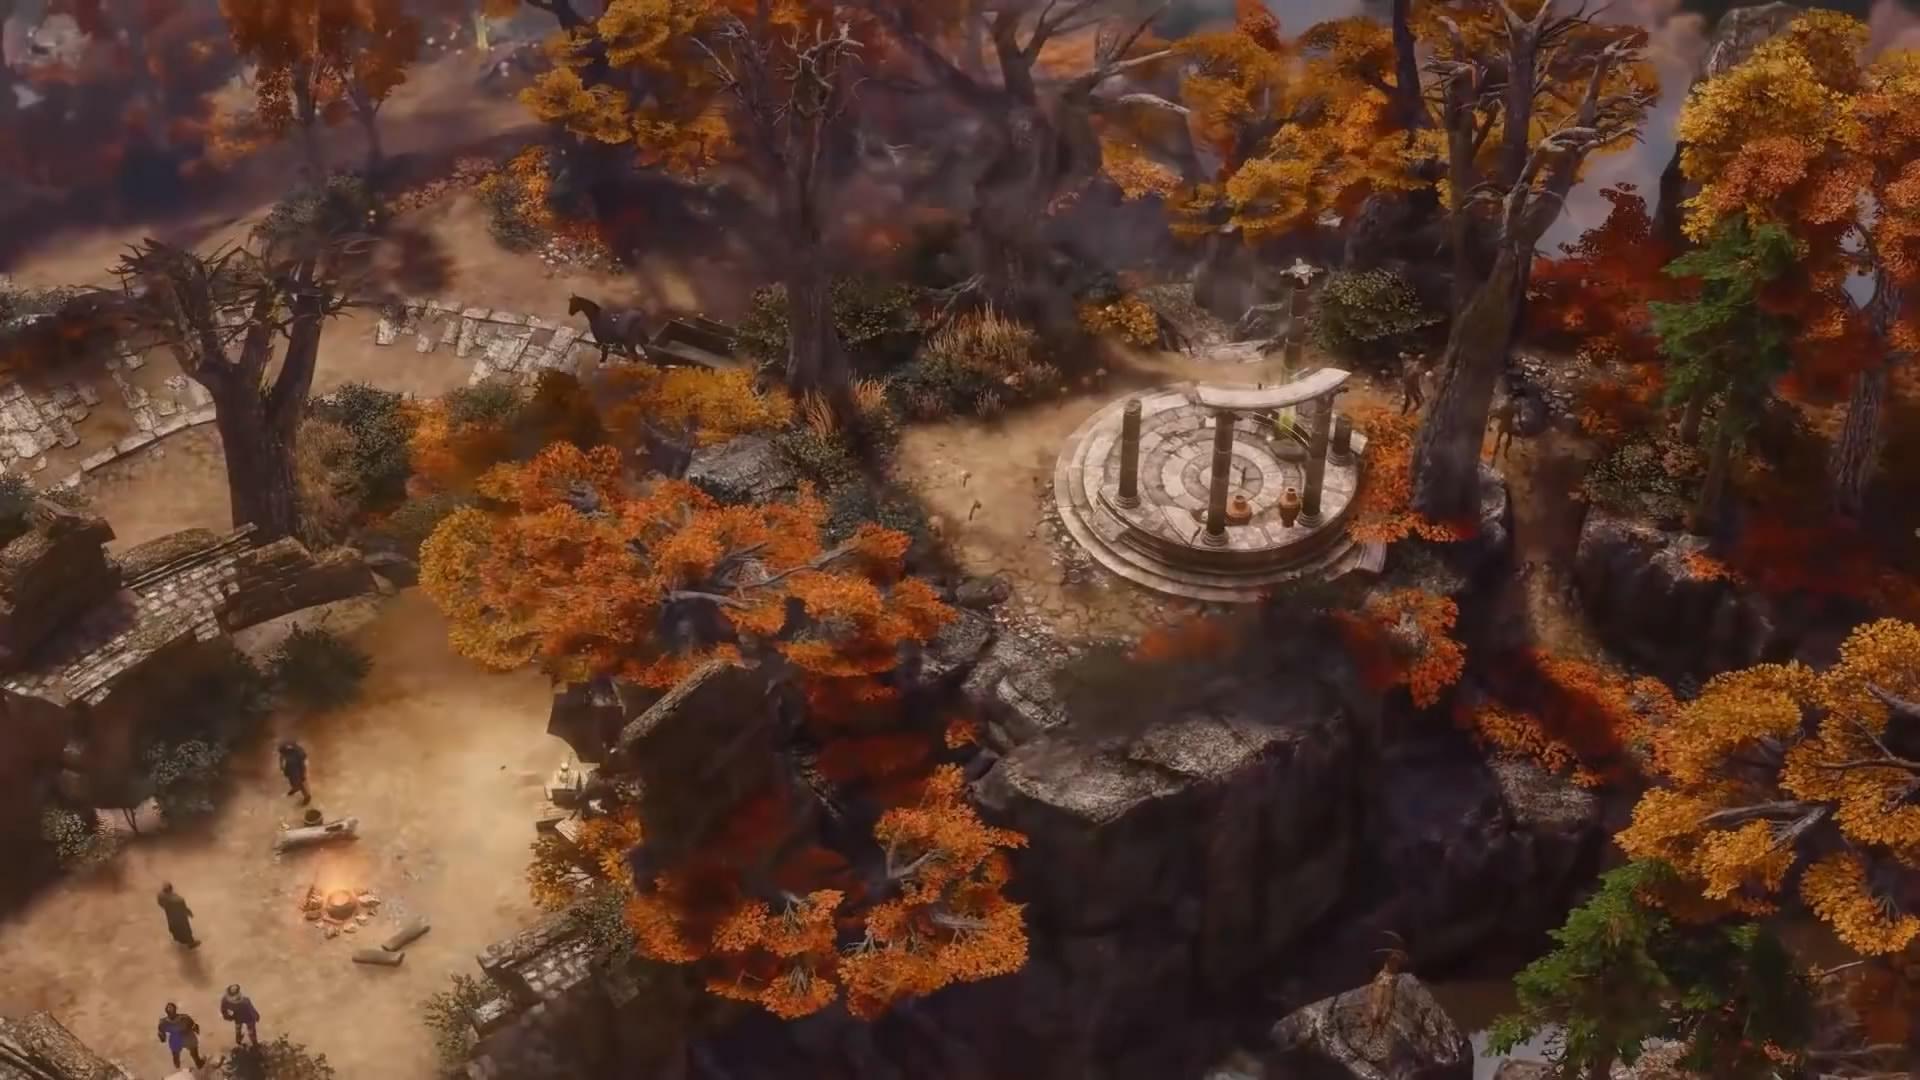 RPG新作《咒语力量3:灵魂收割》预告 2019年Q2发售